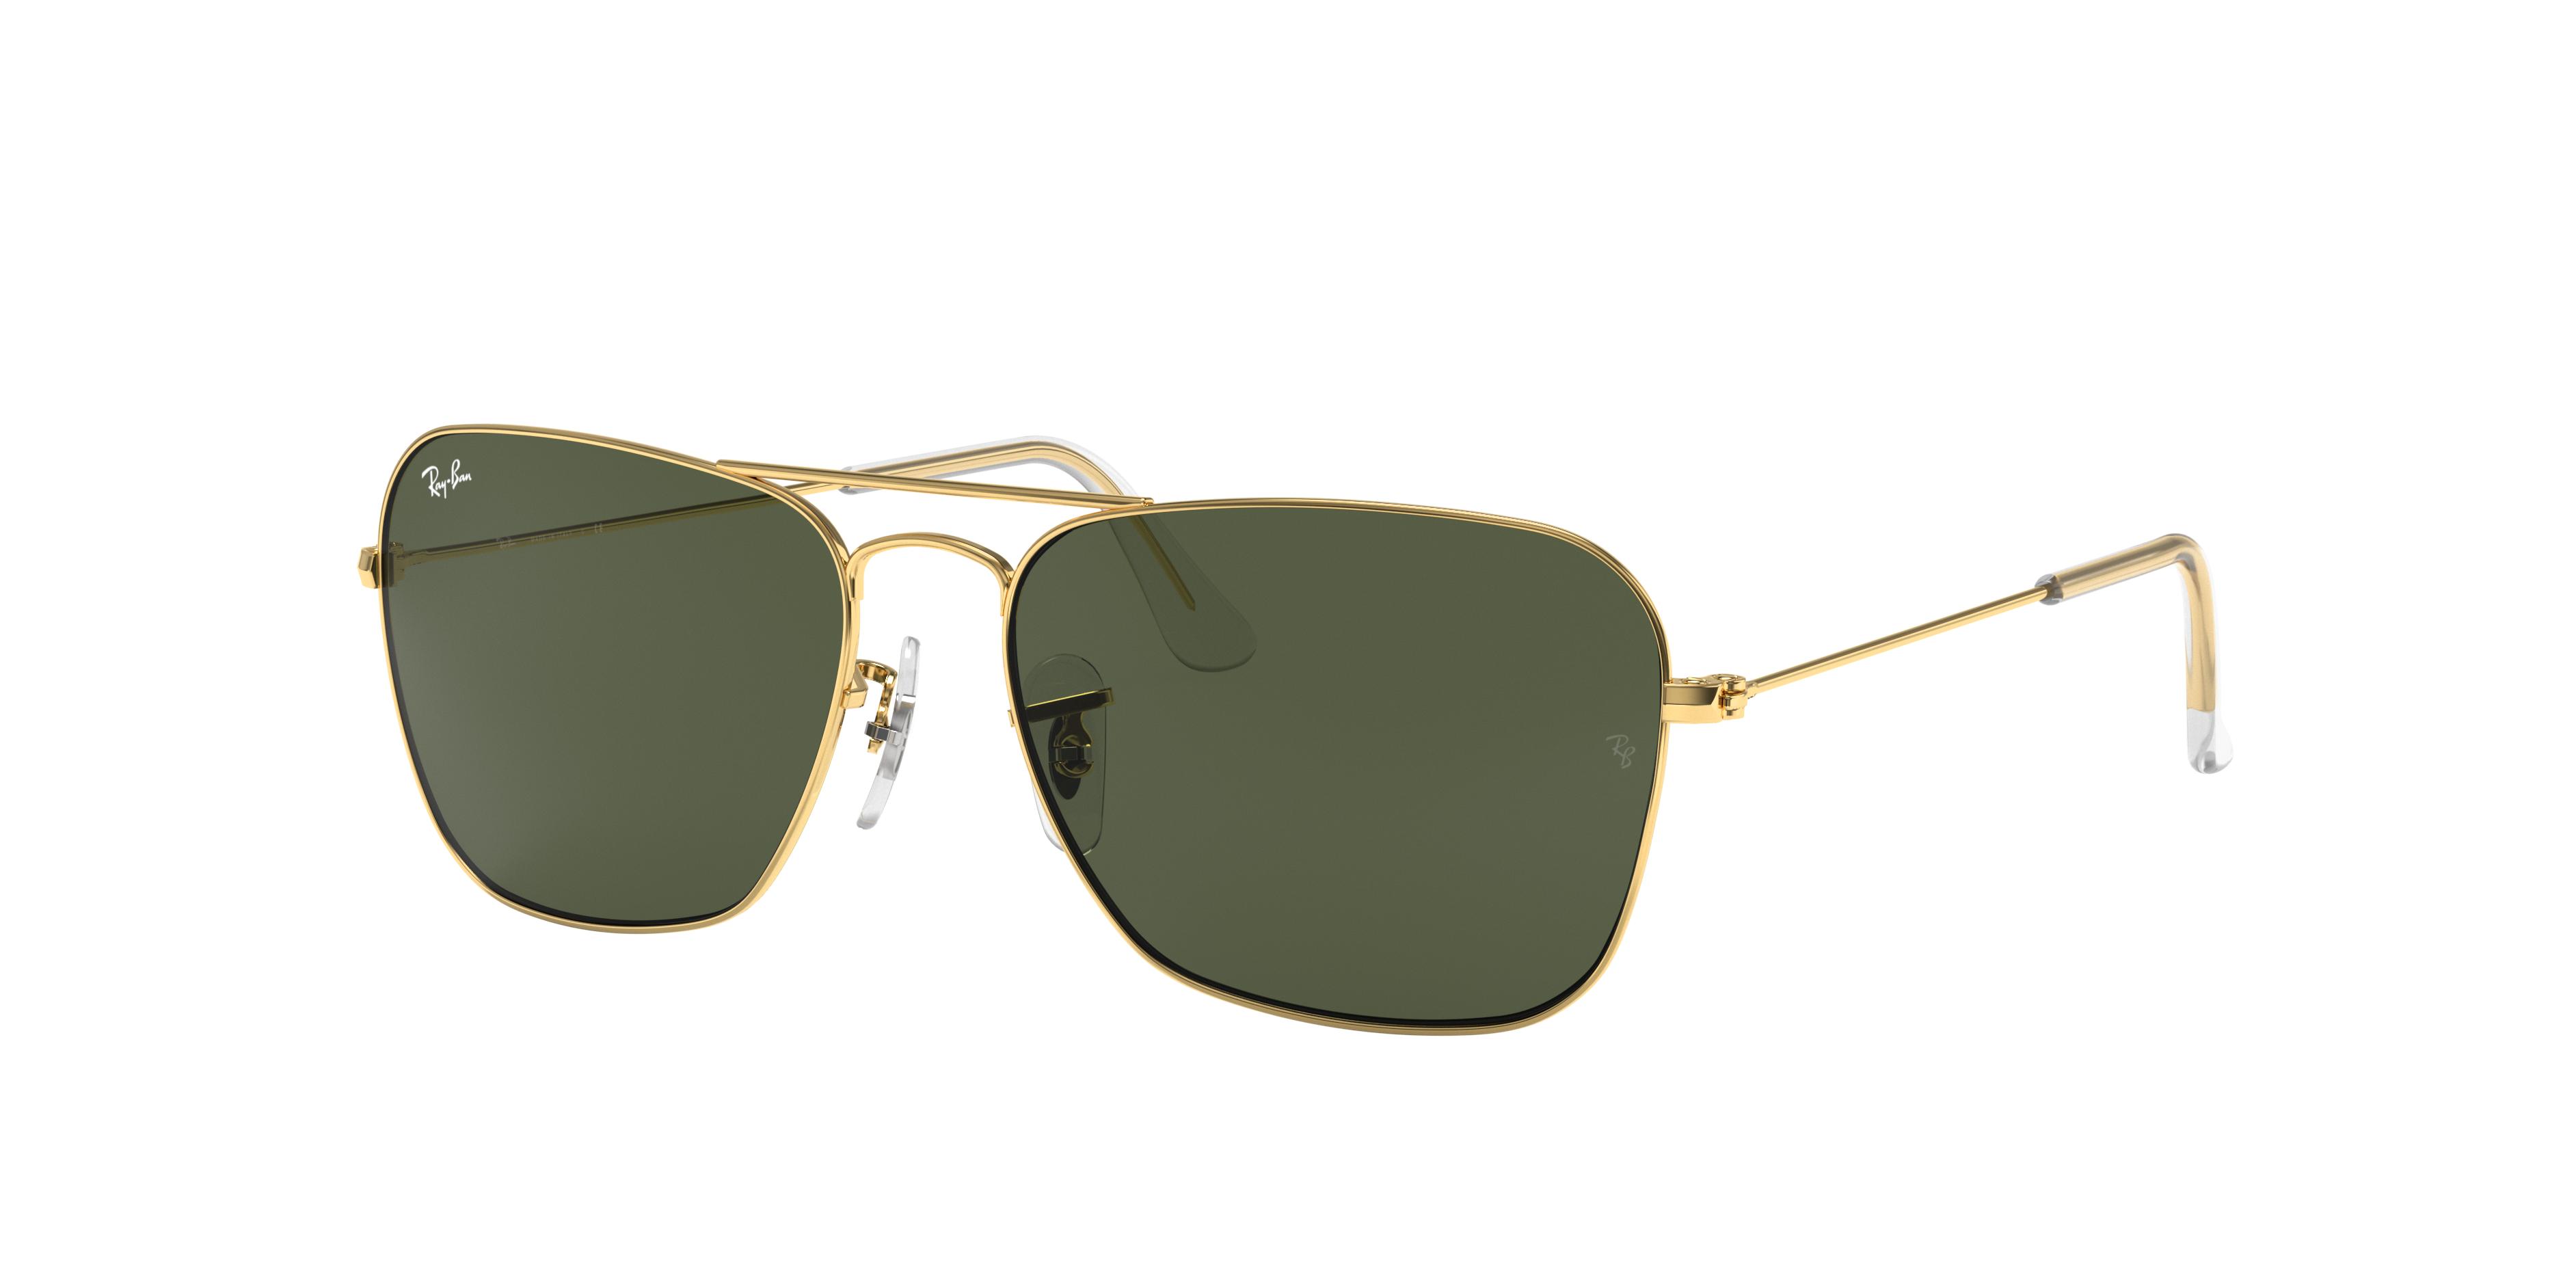 Ray-Ban Caravan Gold, Green Lenses - RB3136